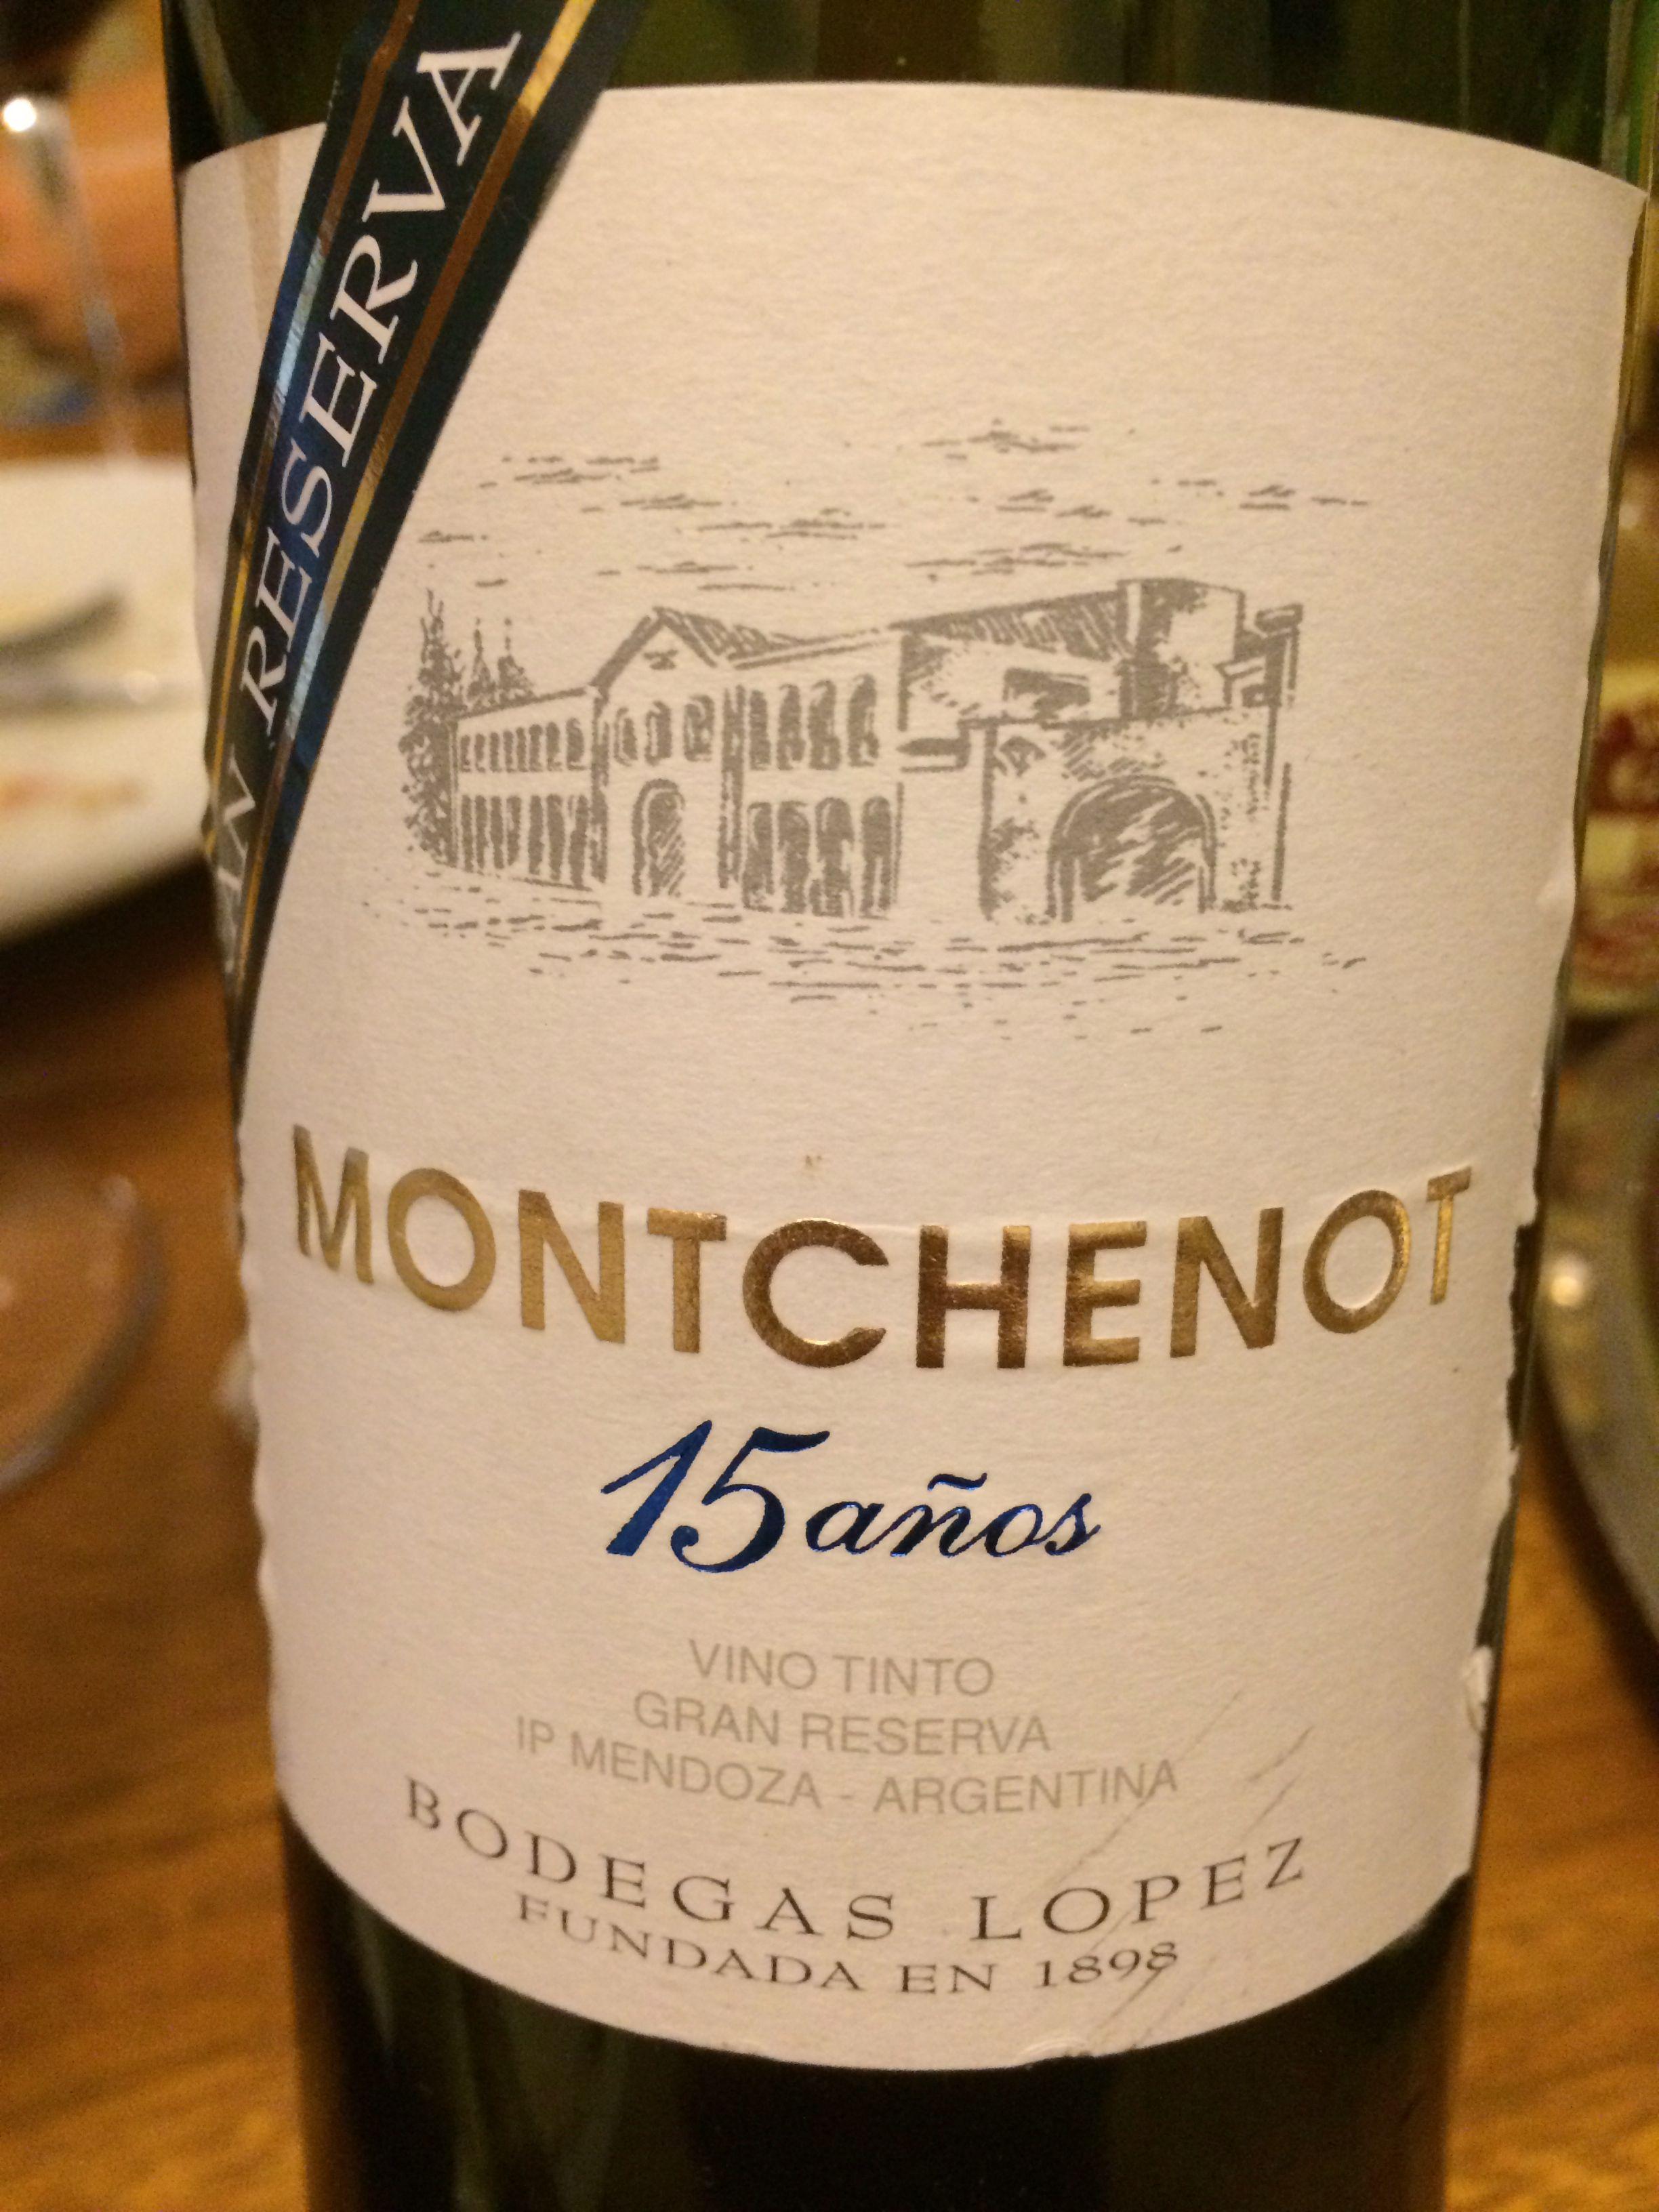 Montchenot 15 años - Blend - 1992 - Lopez - Mendoza, Argentina